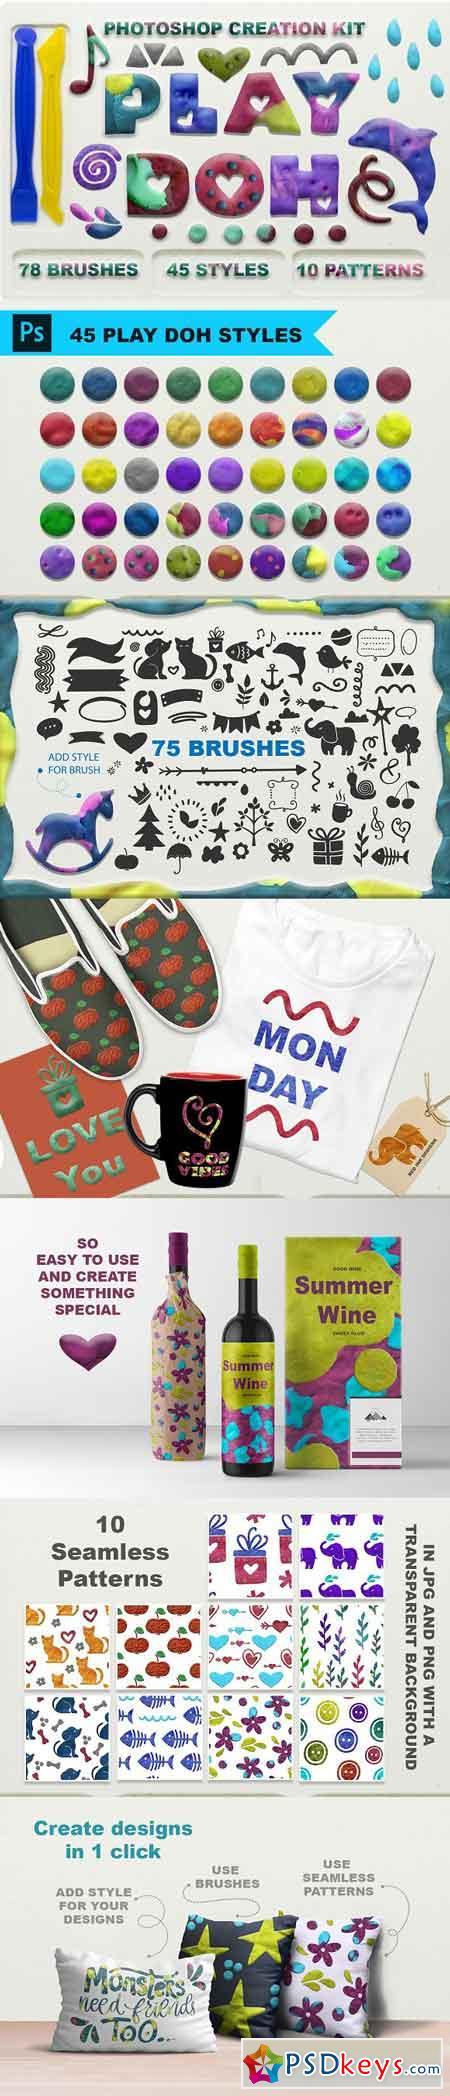 Play Doh Photoshop creation kit 3258463